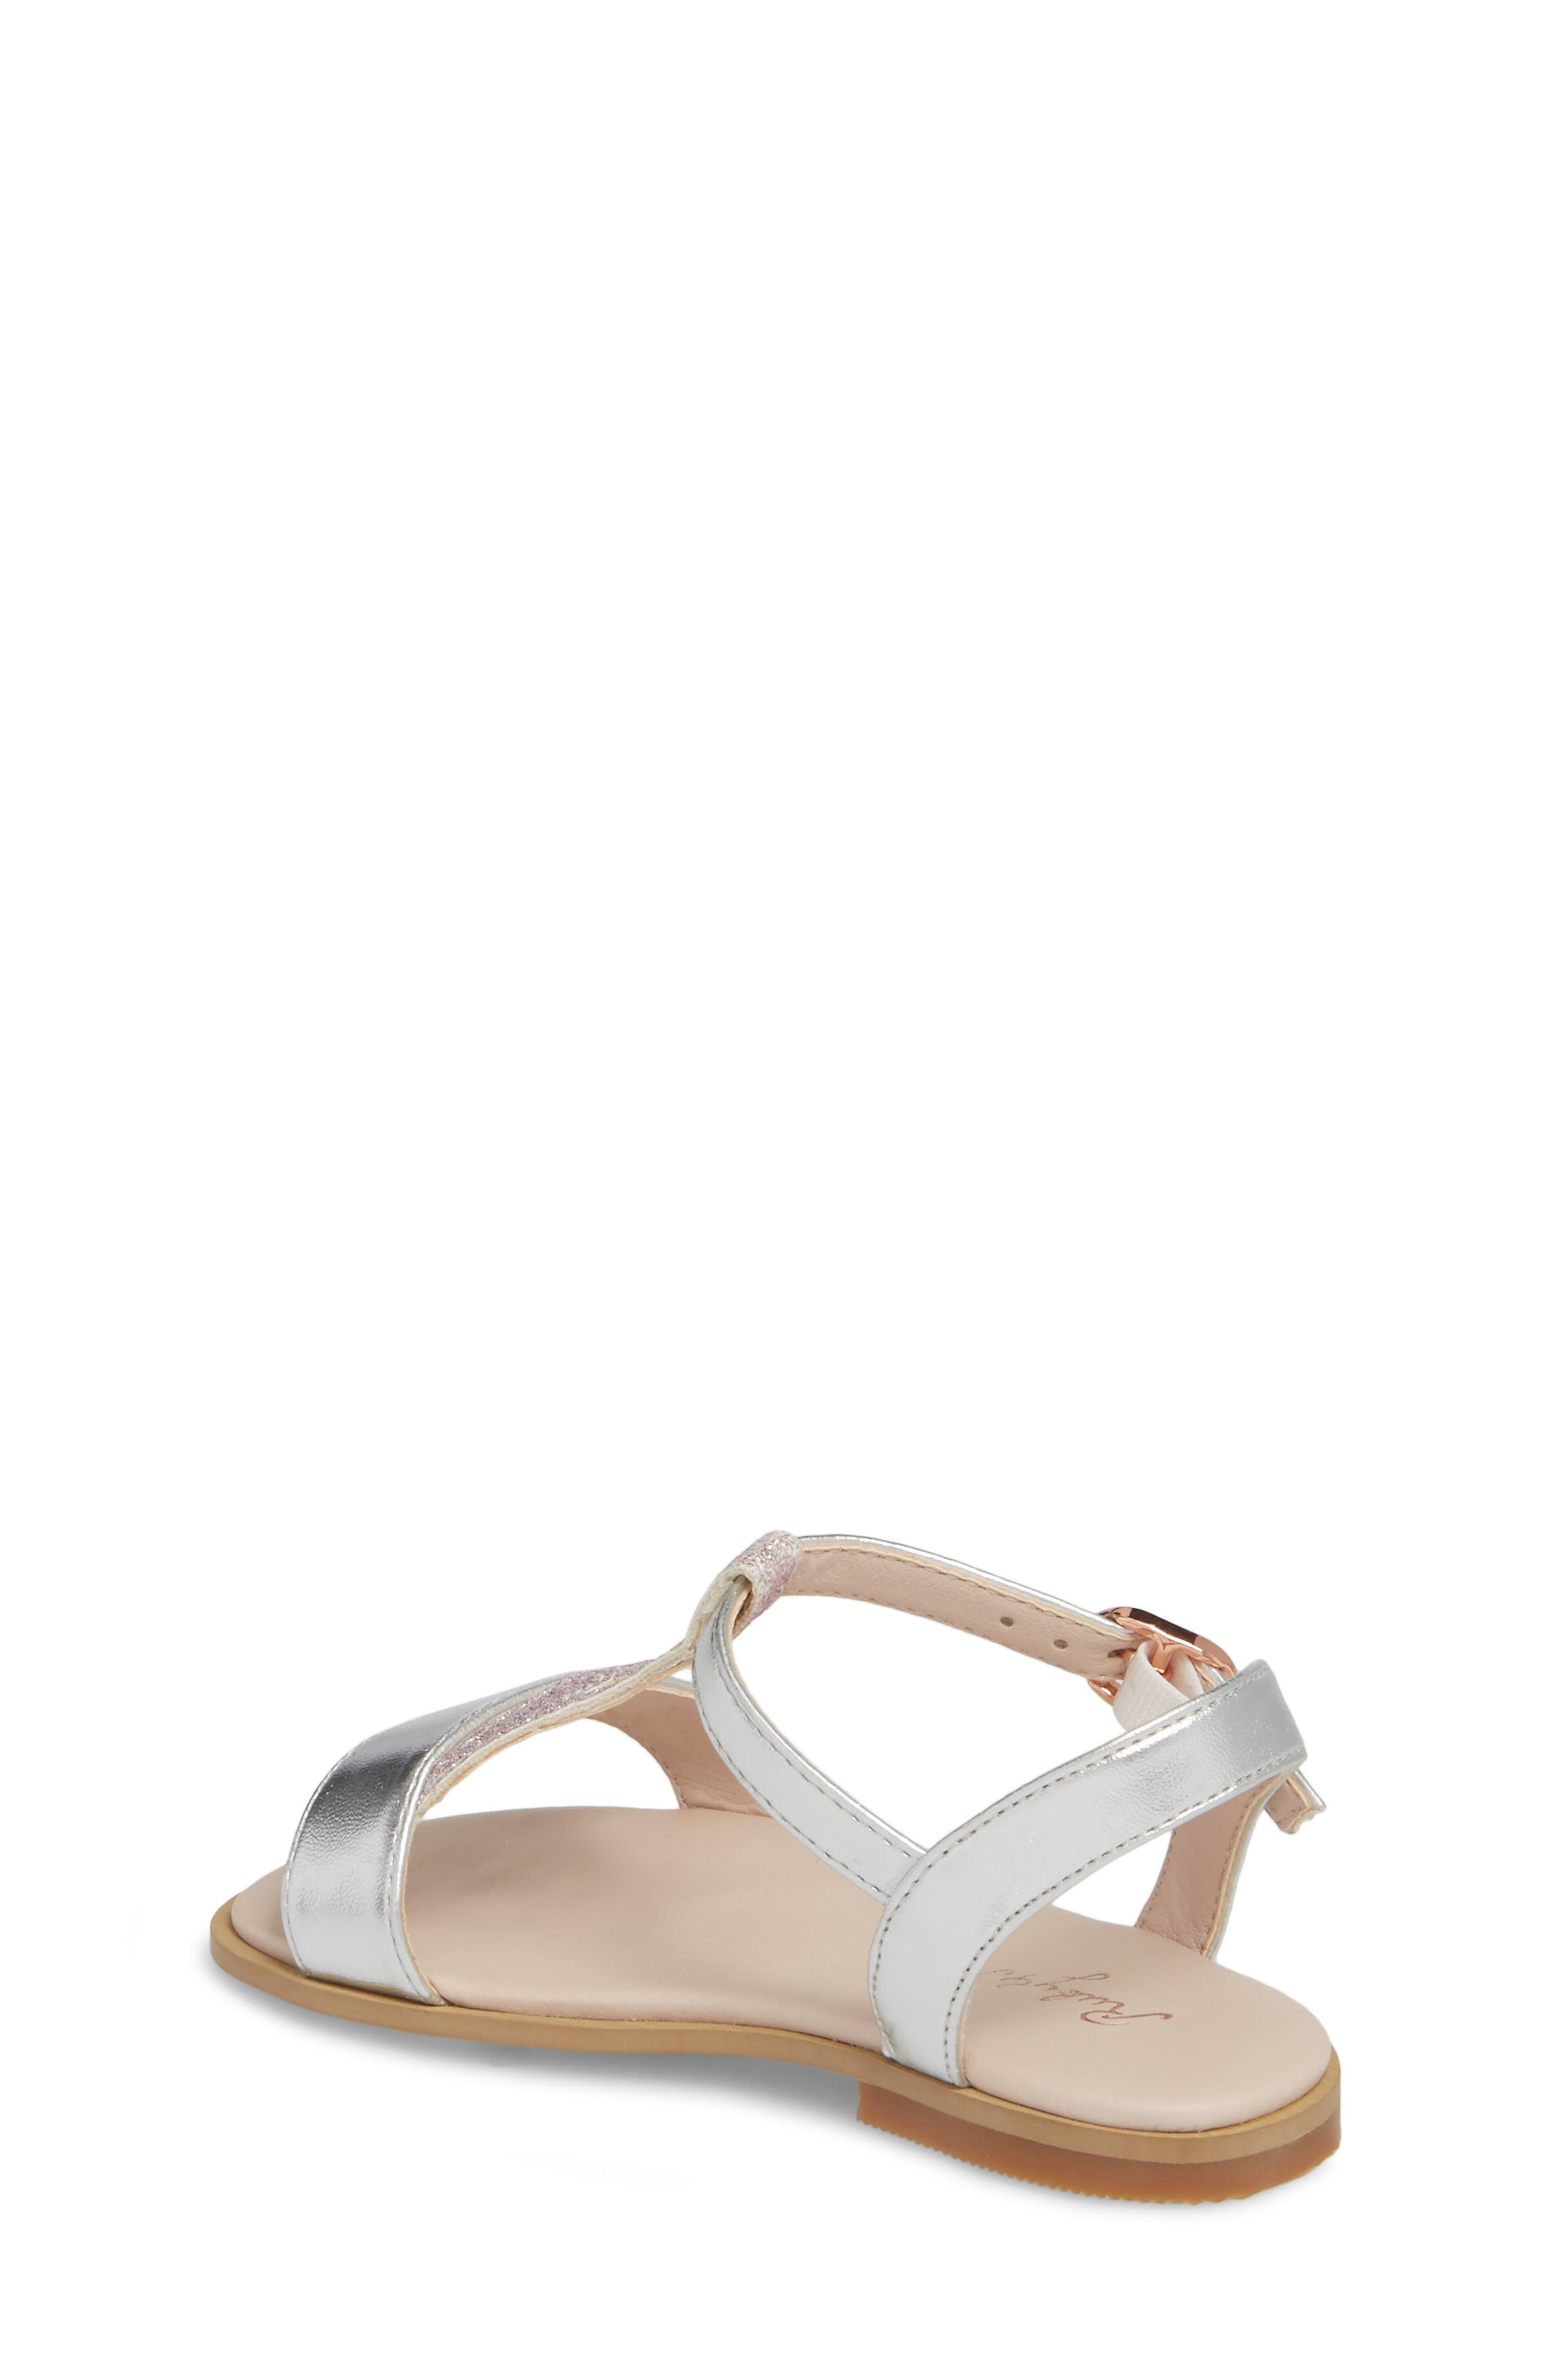 Tegan Glitter T-Strap Sandal,                             Alternate thumbnail 2, color,                             040